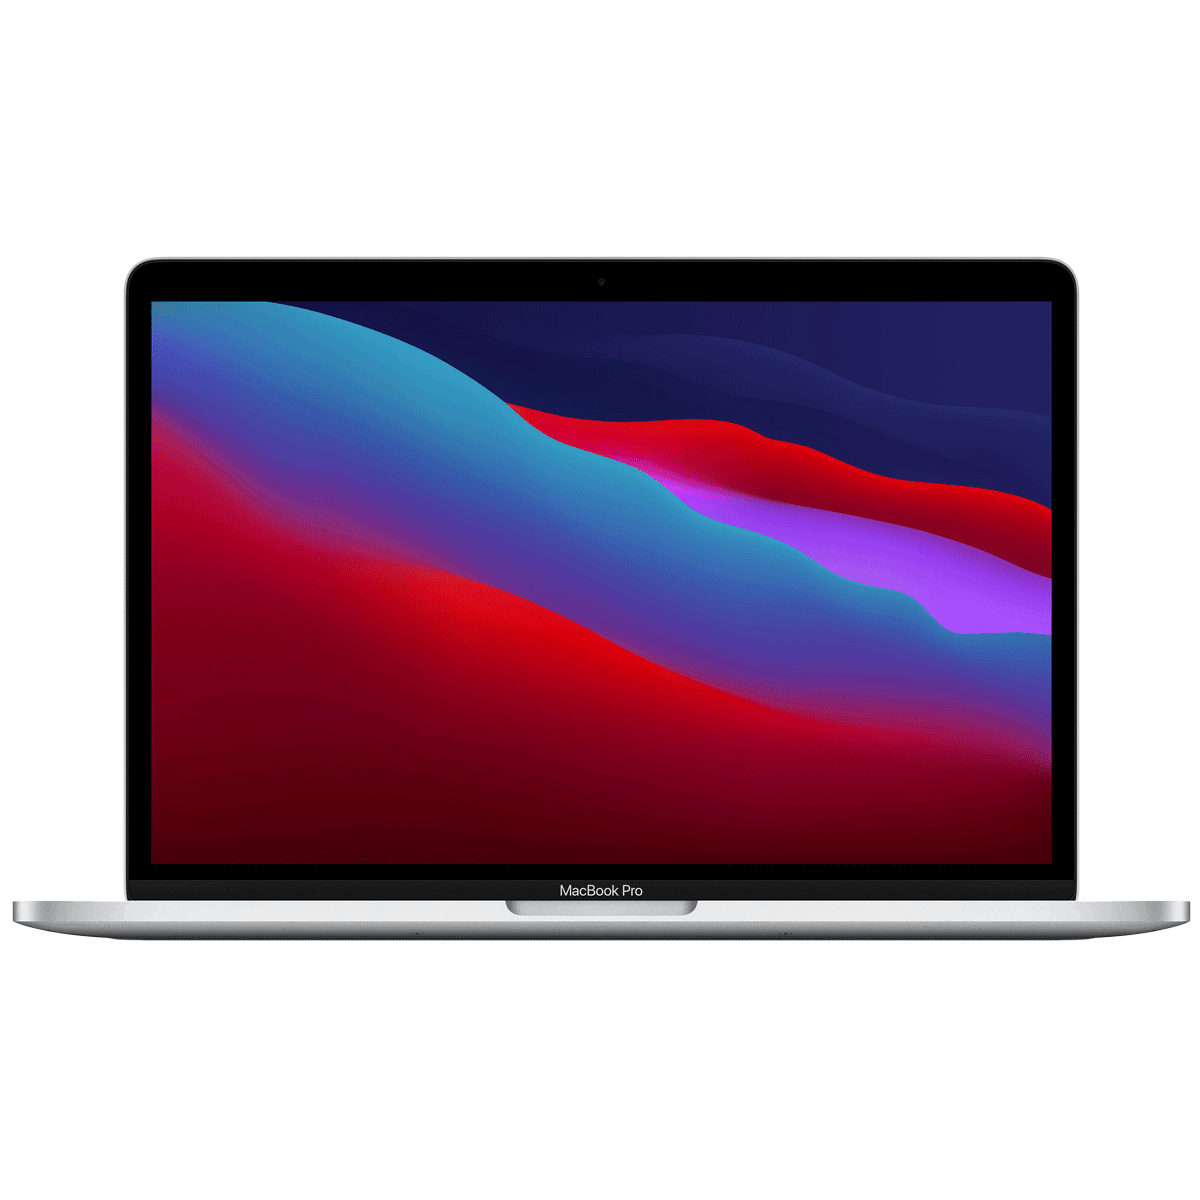 Apple MacBook Pro (MYDC2HN/A) M1 Chip macOS Big Sur Laptop (8GB RAM, 512GB SSD, Apple M1 GPU, 33.78cm, Silver)